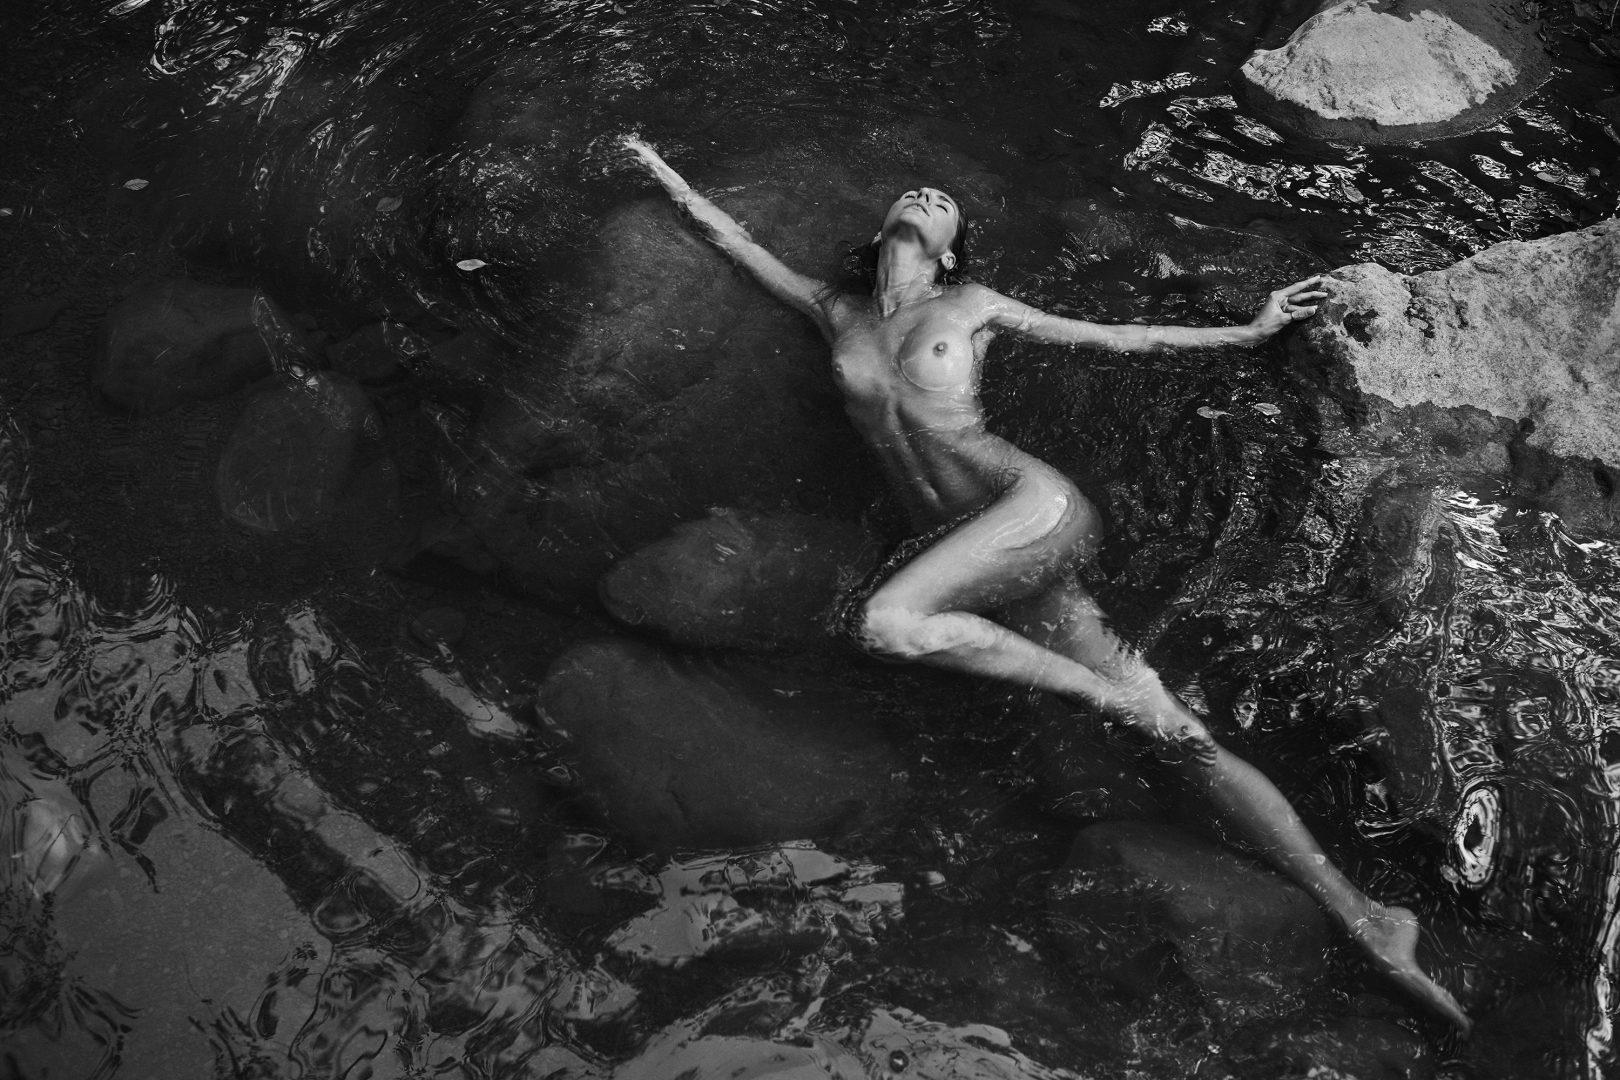 naked girl in hot spring by stefan rappo